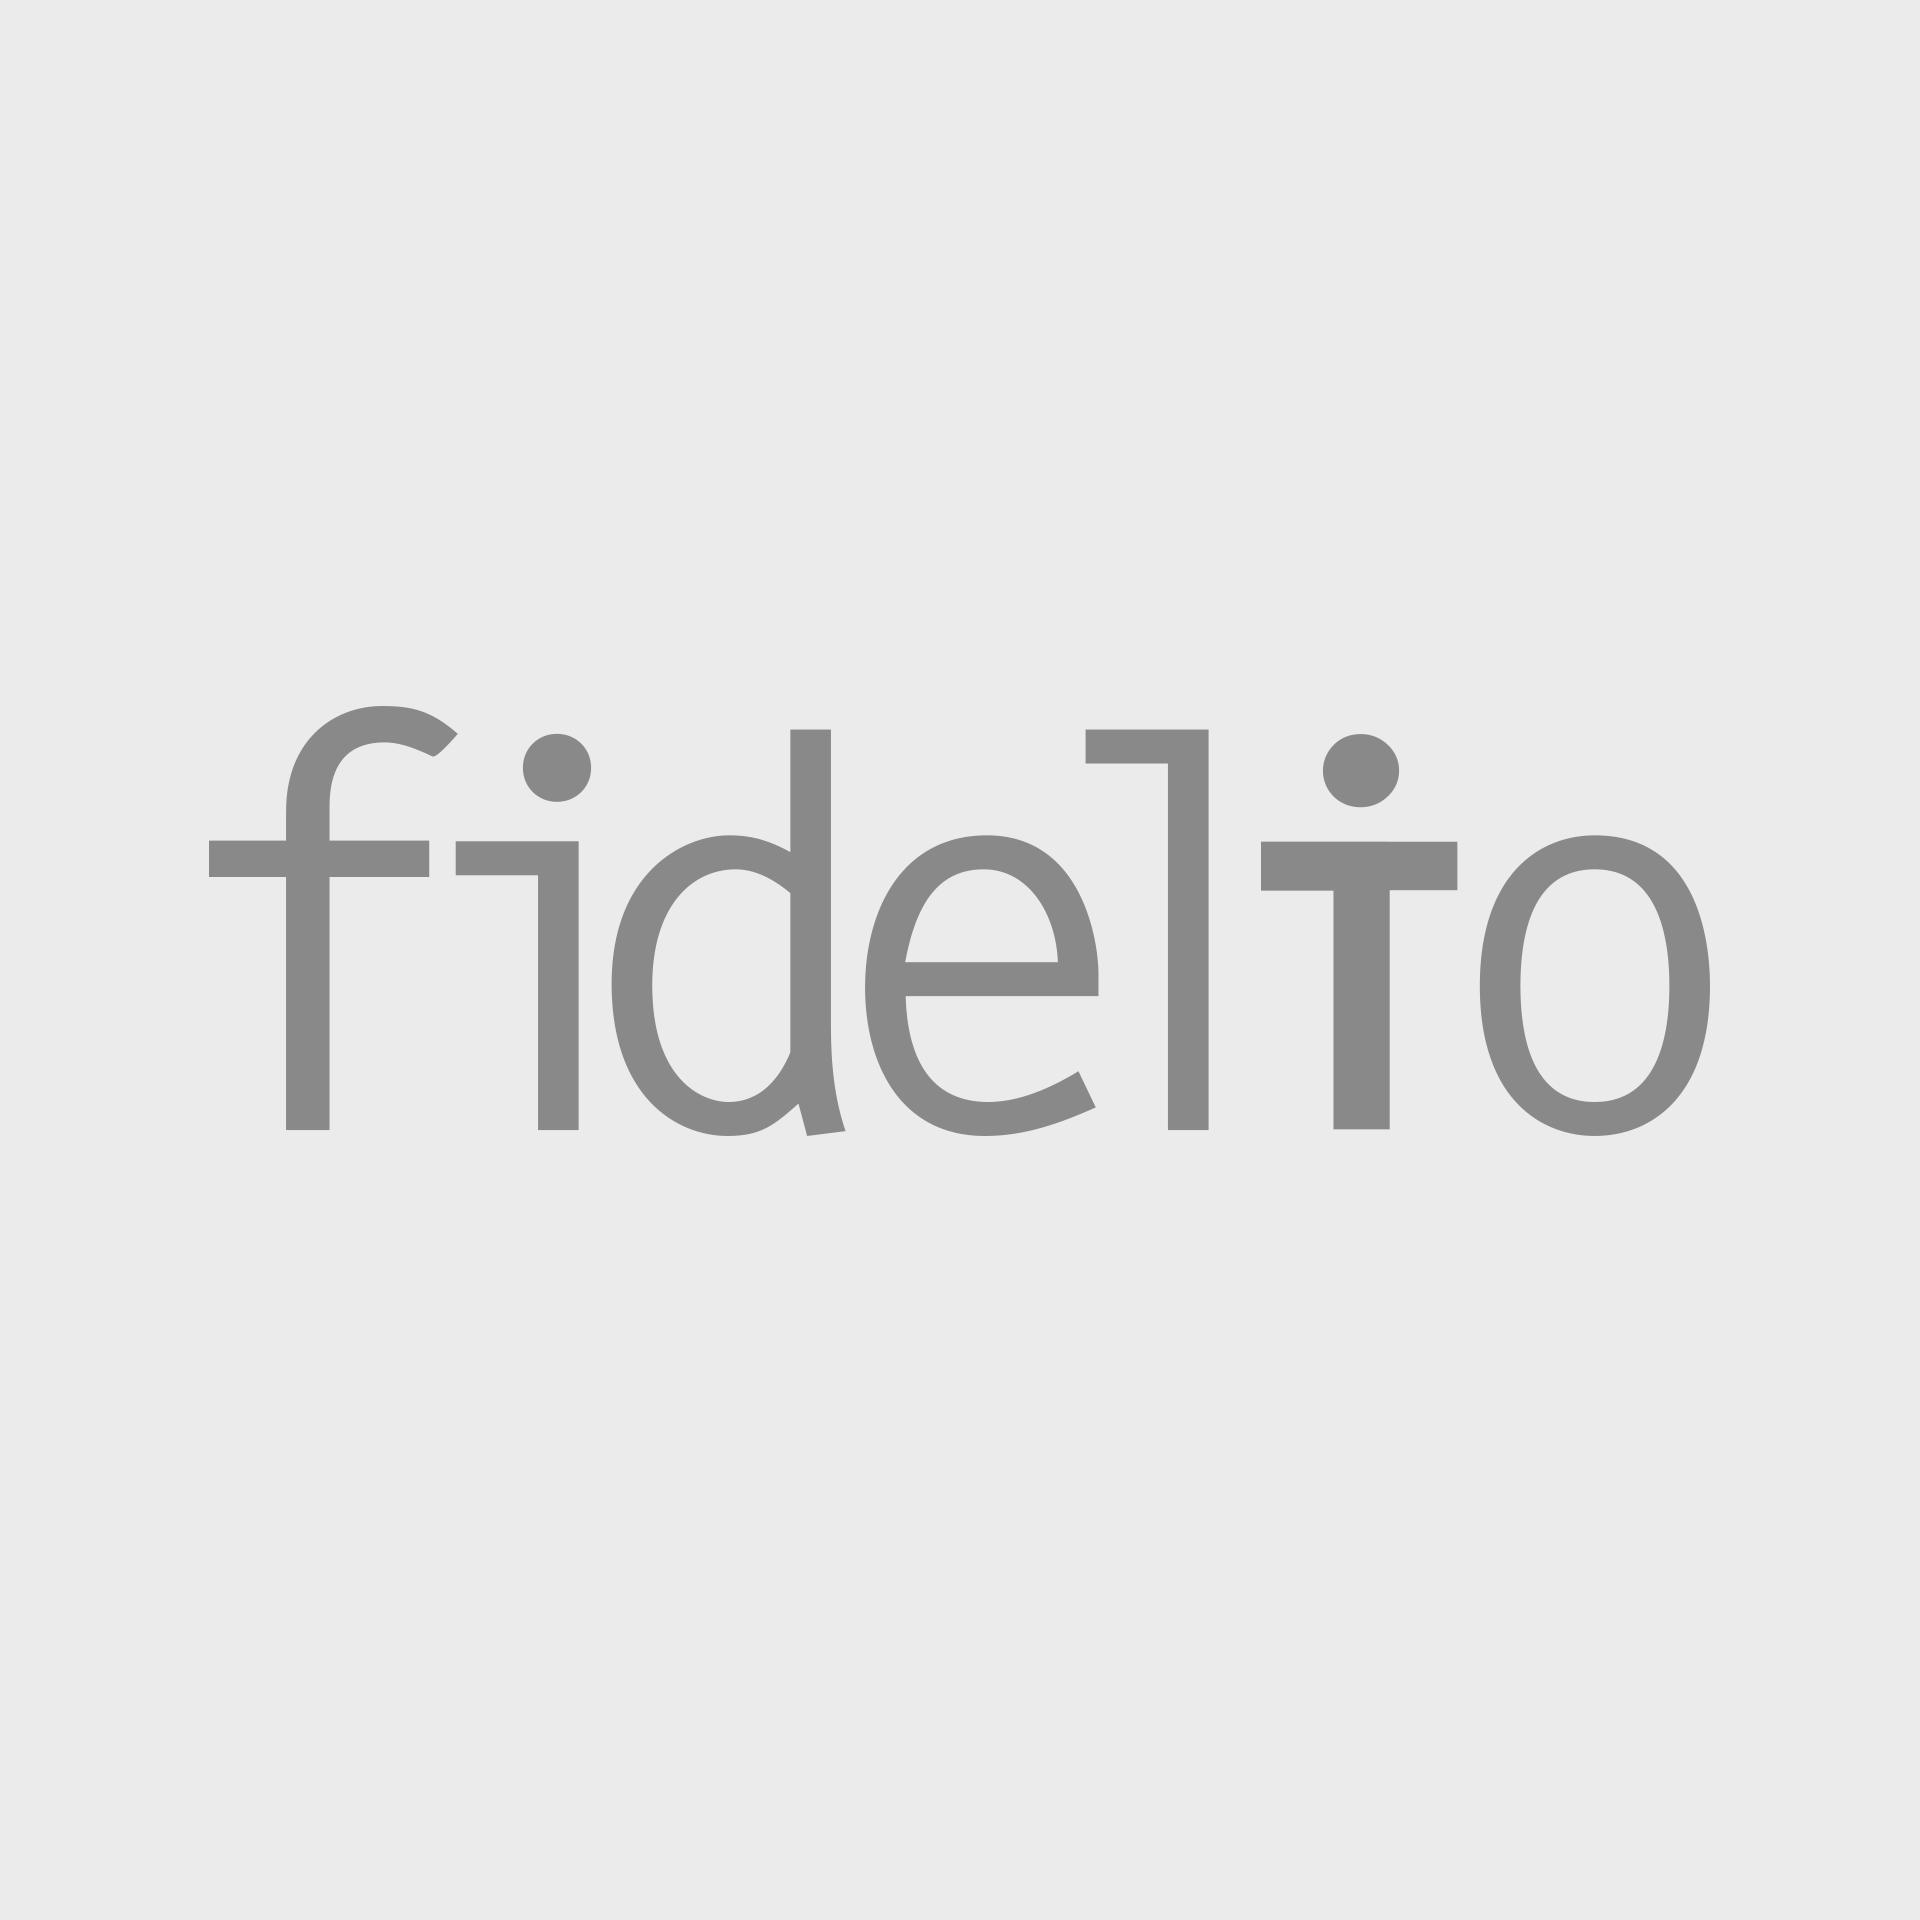 MetronomTeto 06.23-DuoSera FBevent fl